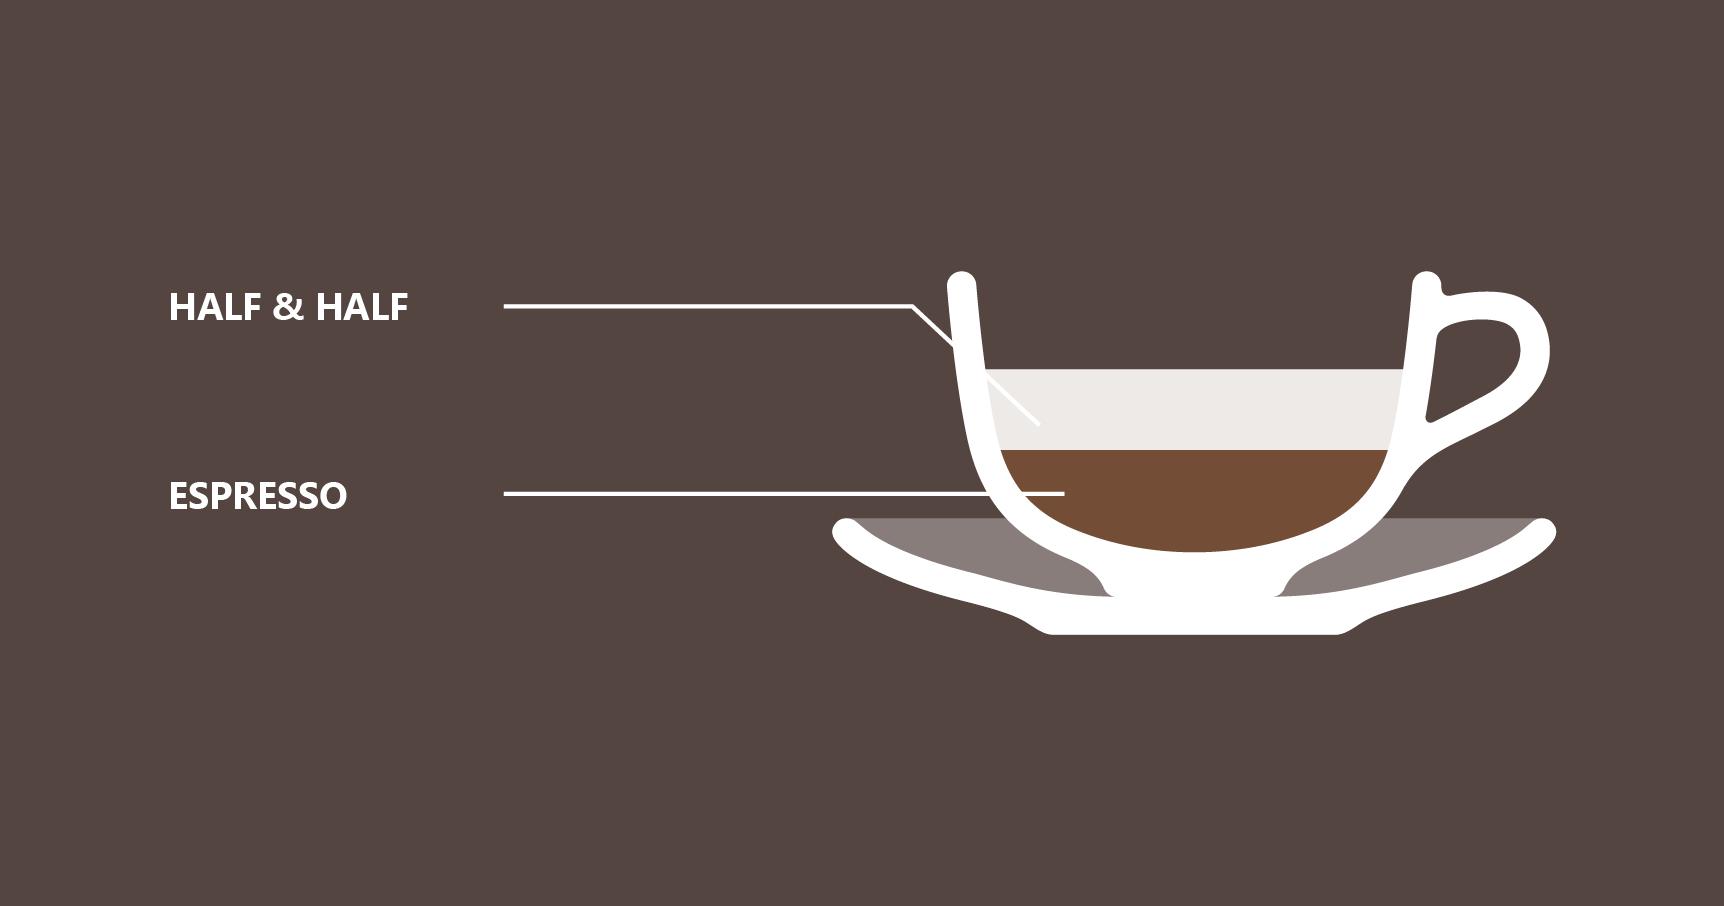 The classic Caffe Breve recipe illustration